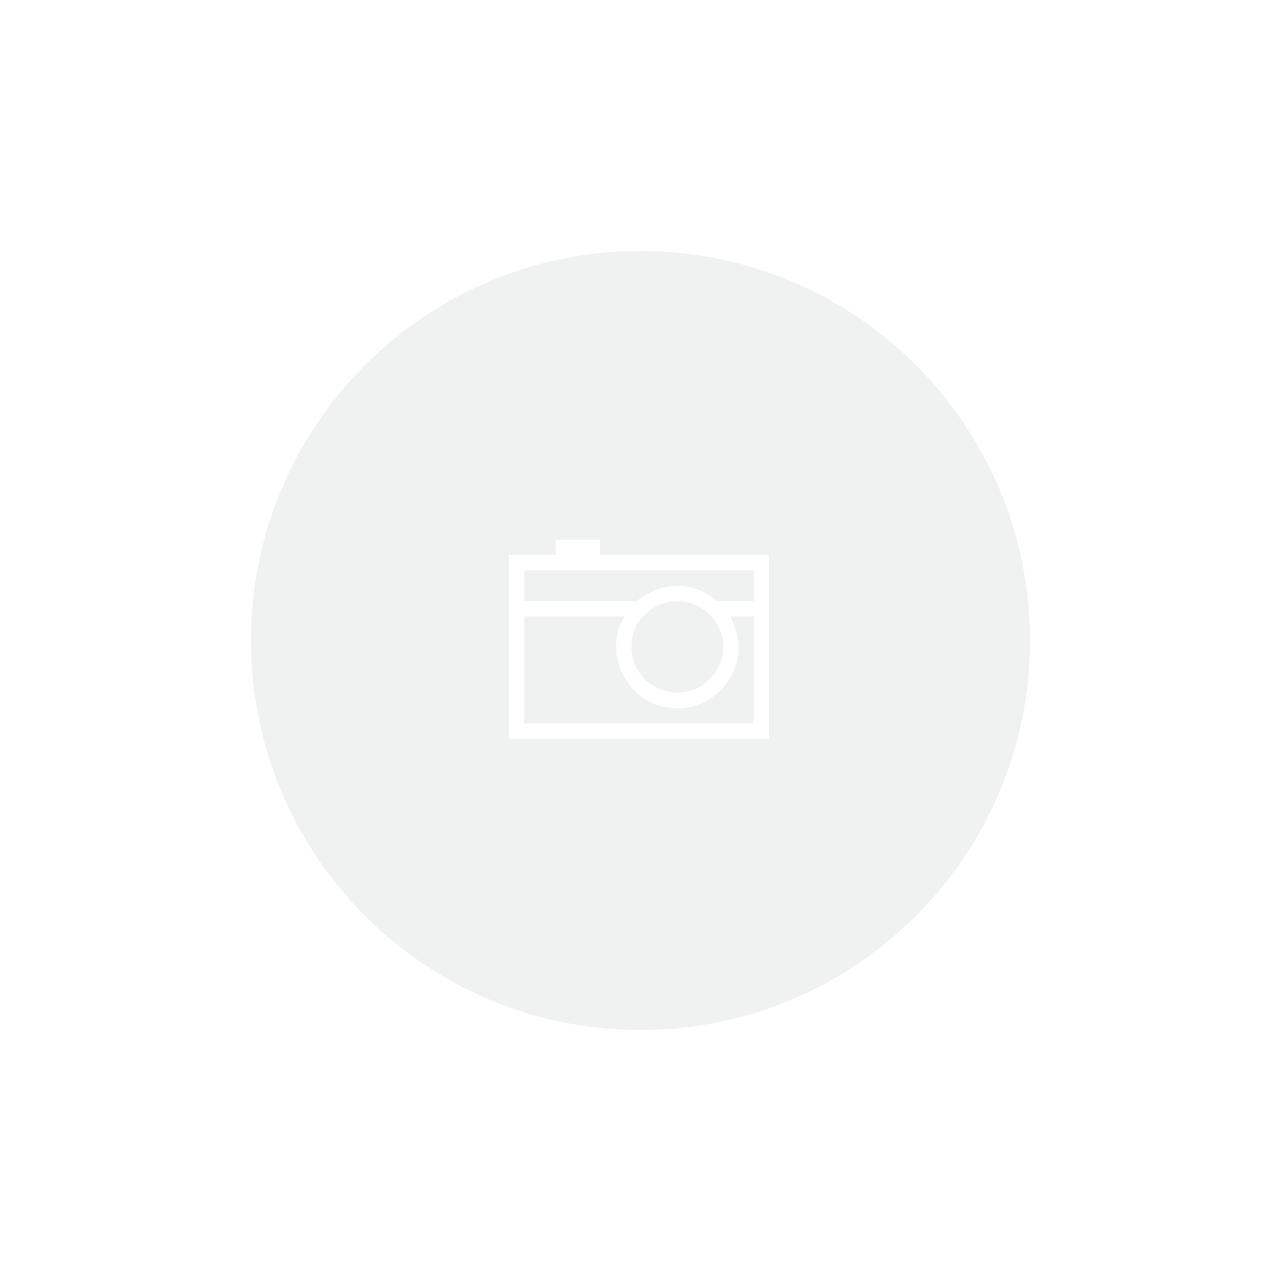 Batedor Manual ø 45 cm Speciale Tramontina